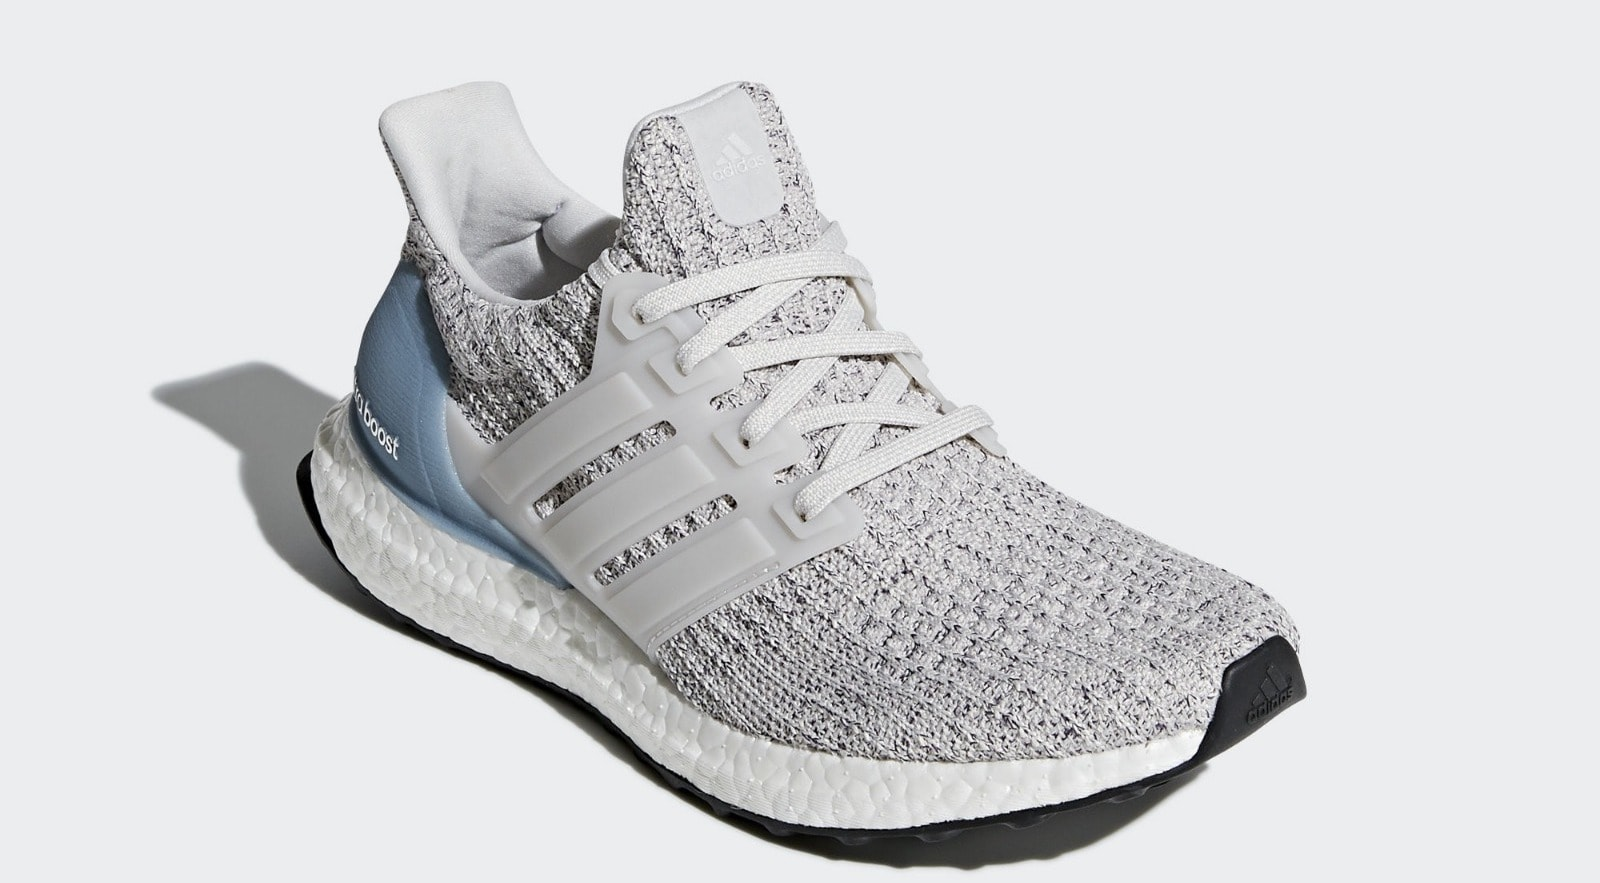 Adidas De Ultra Impulso 4.0 Blanco Gris RUC9f